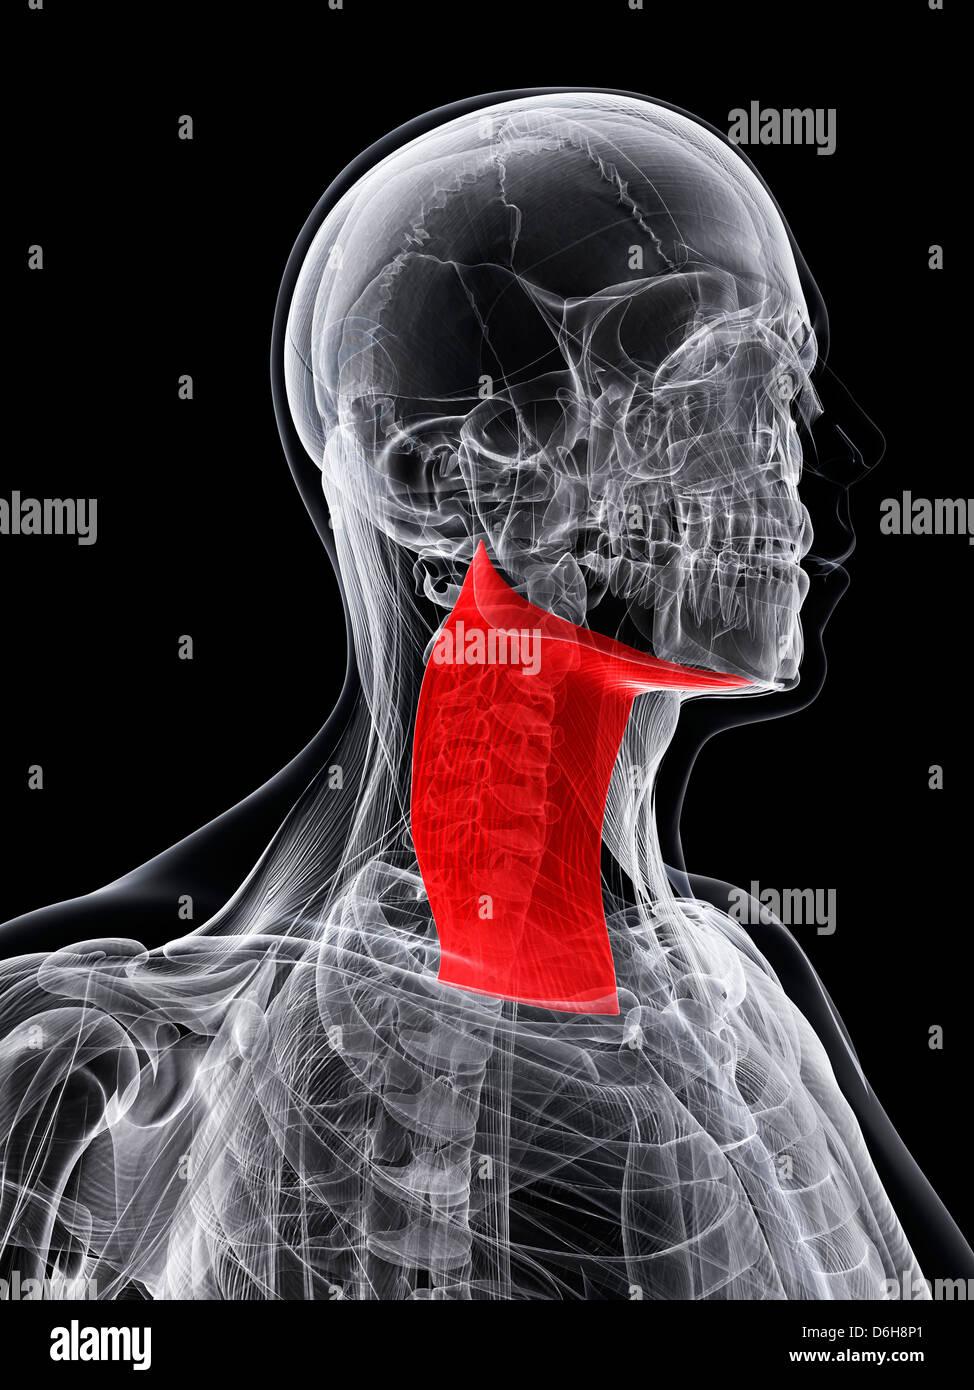 Hals-Muskeln, artwork Stockfoto, Bild: 55699113 - Alamy